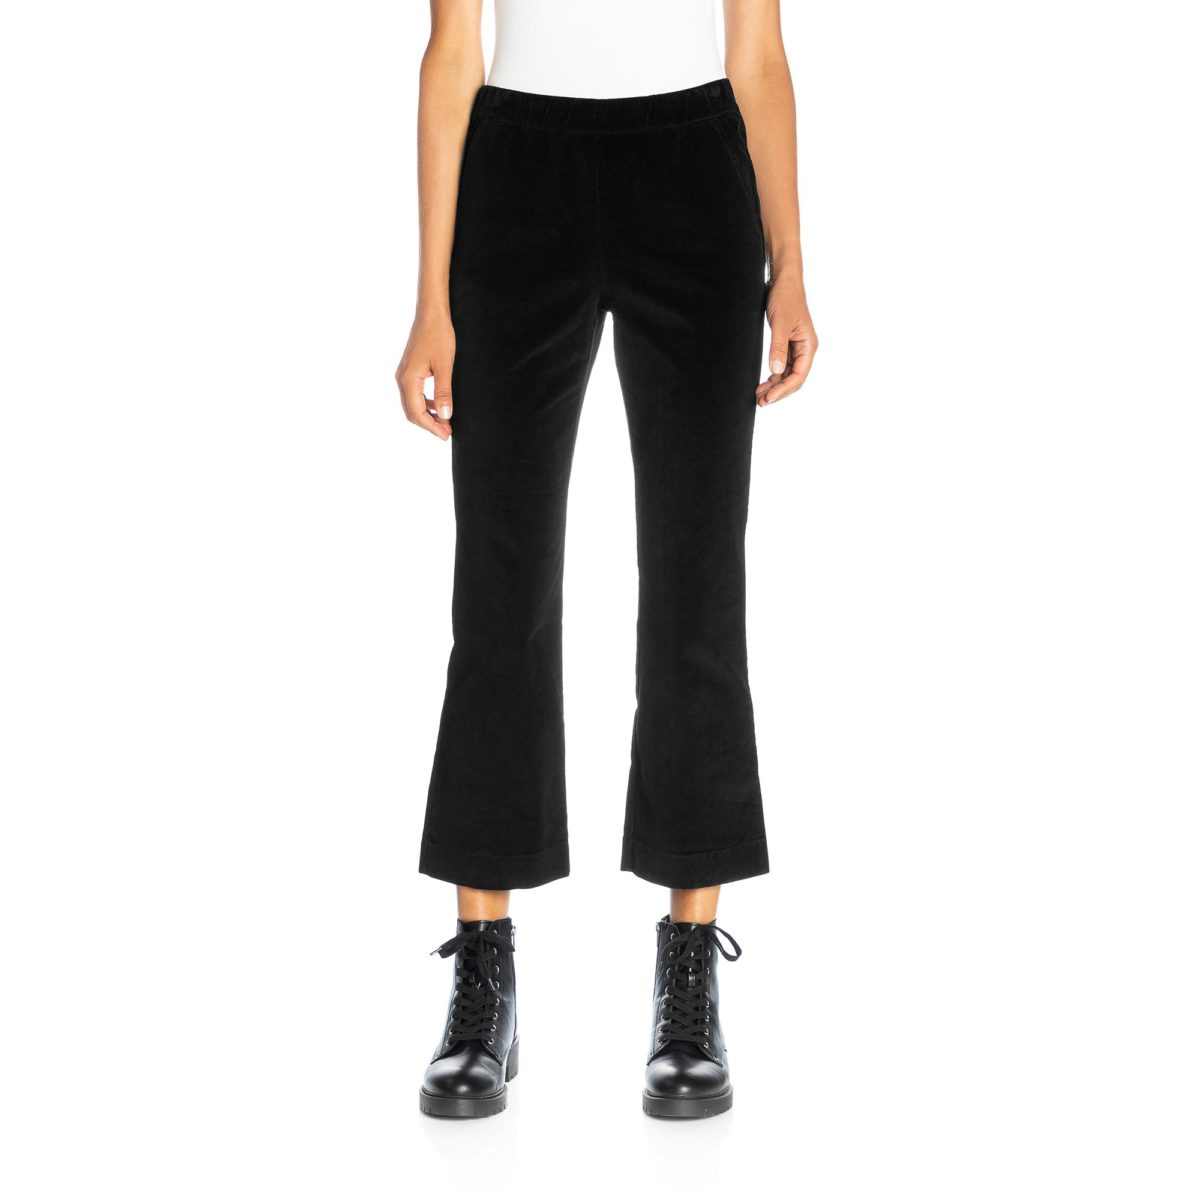 Pantalone Flare in velluto a costine